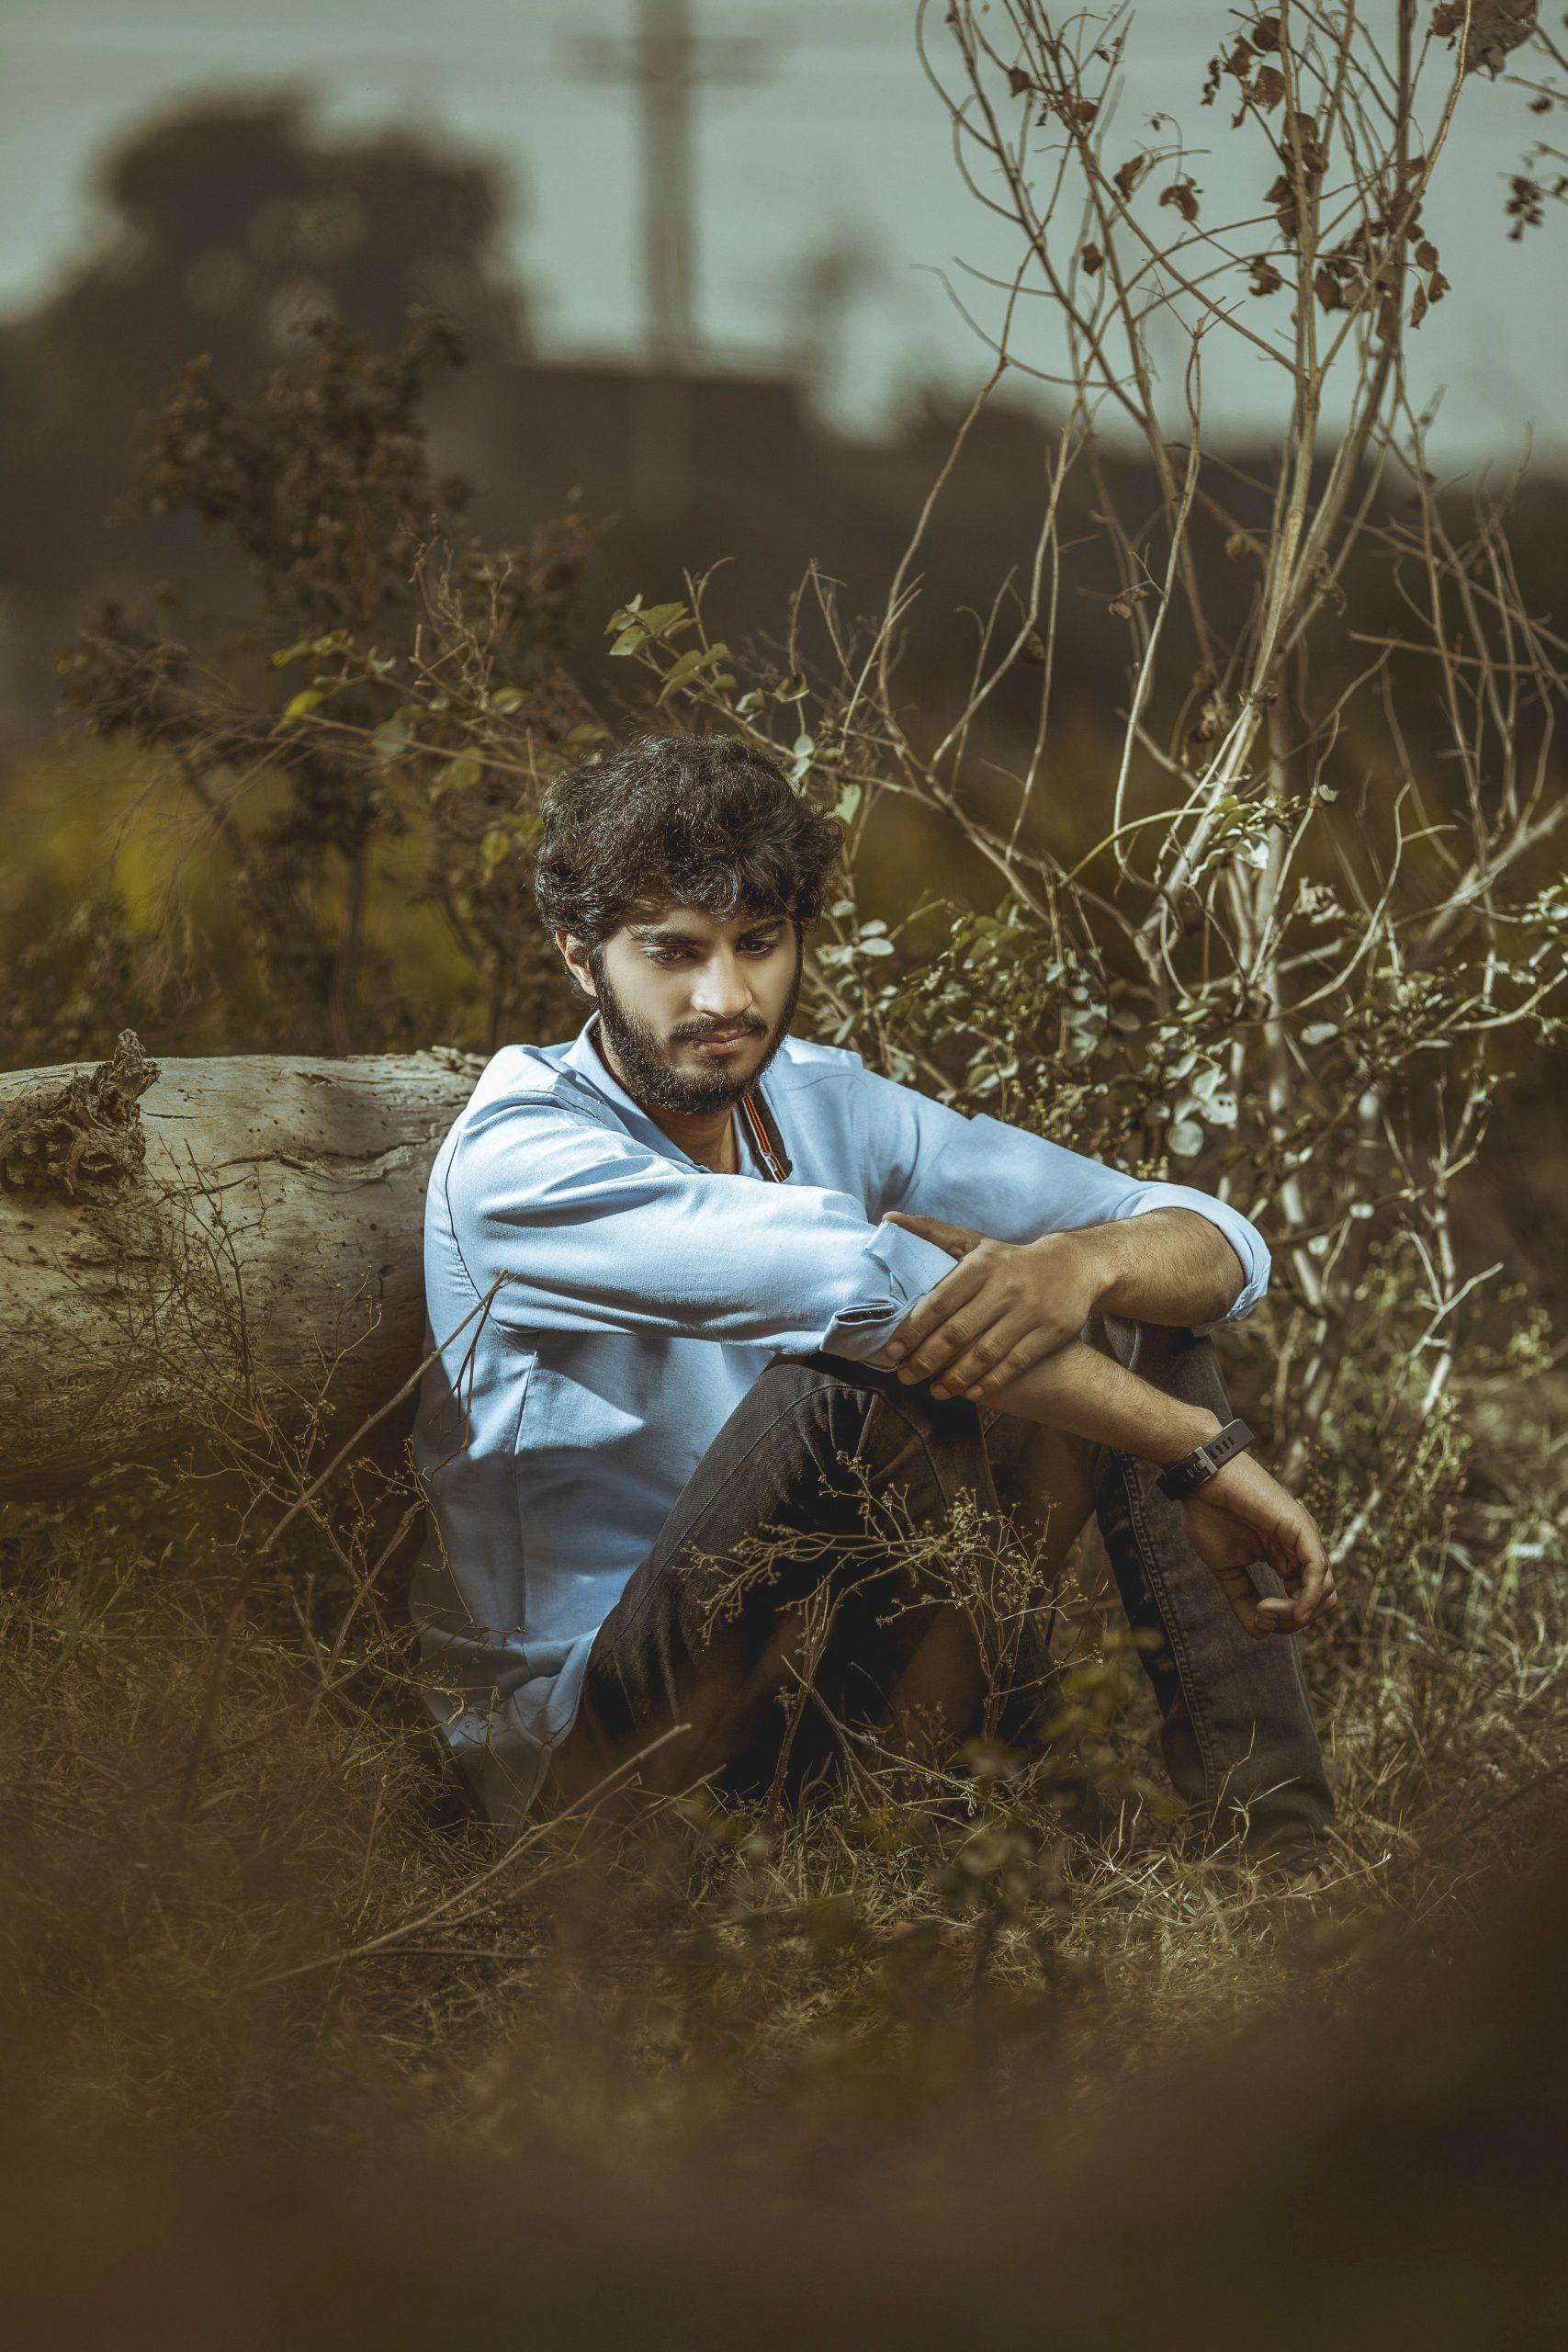 Sad Boy Dp Images wallpaper free download